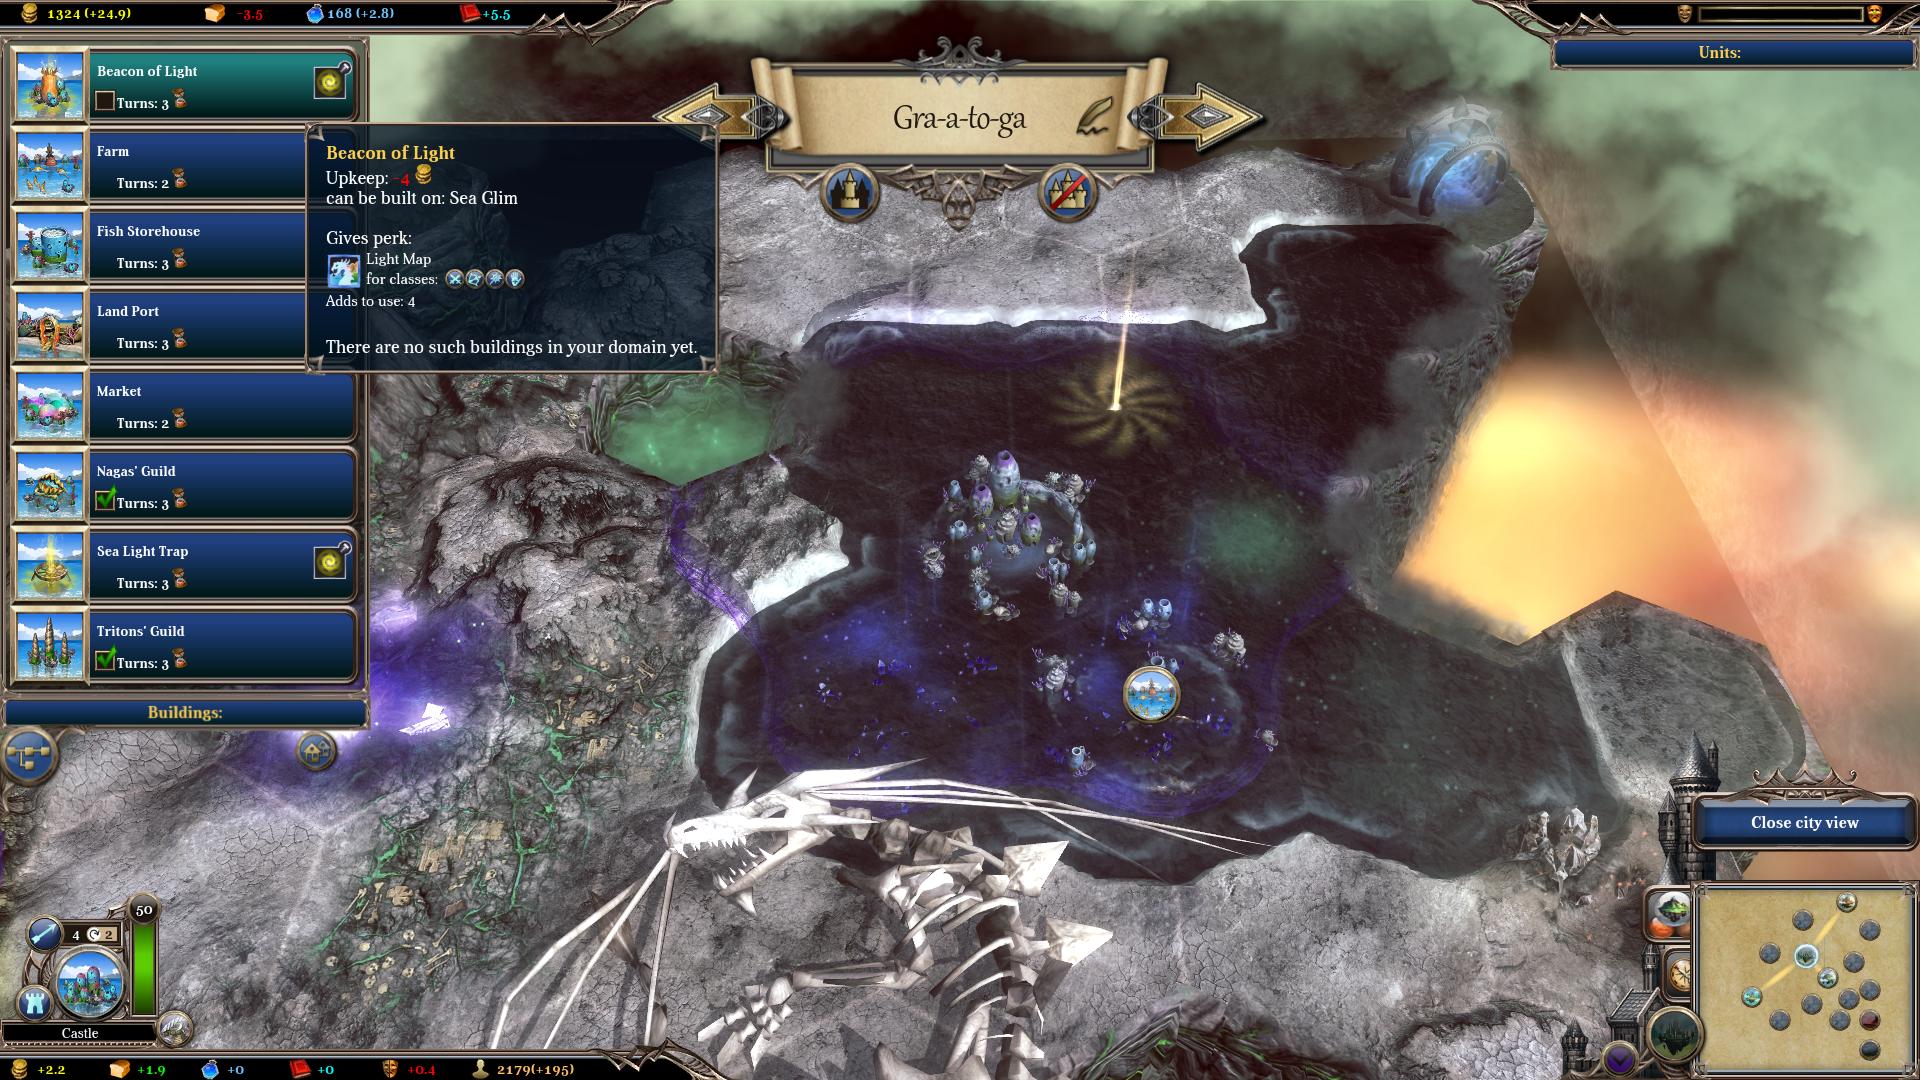 Oznámena expanze Warlock 2: Wrath of the Nagas 101350